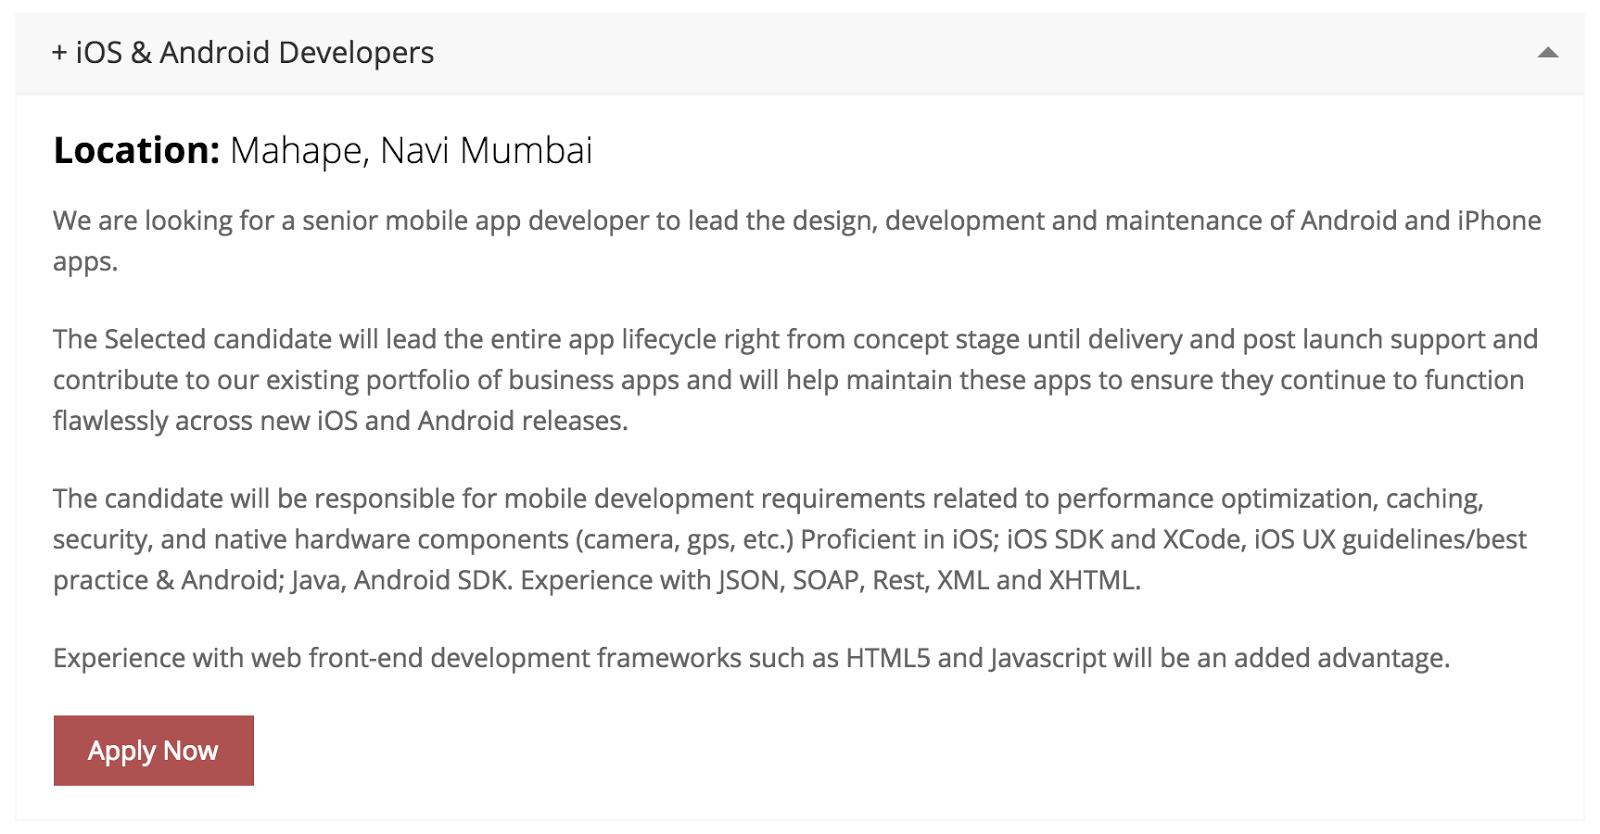 app developer job description business business letters sample screen2bshot2b2016 04 06 - App Developer Job Description